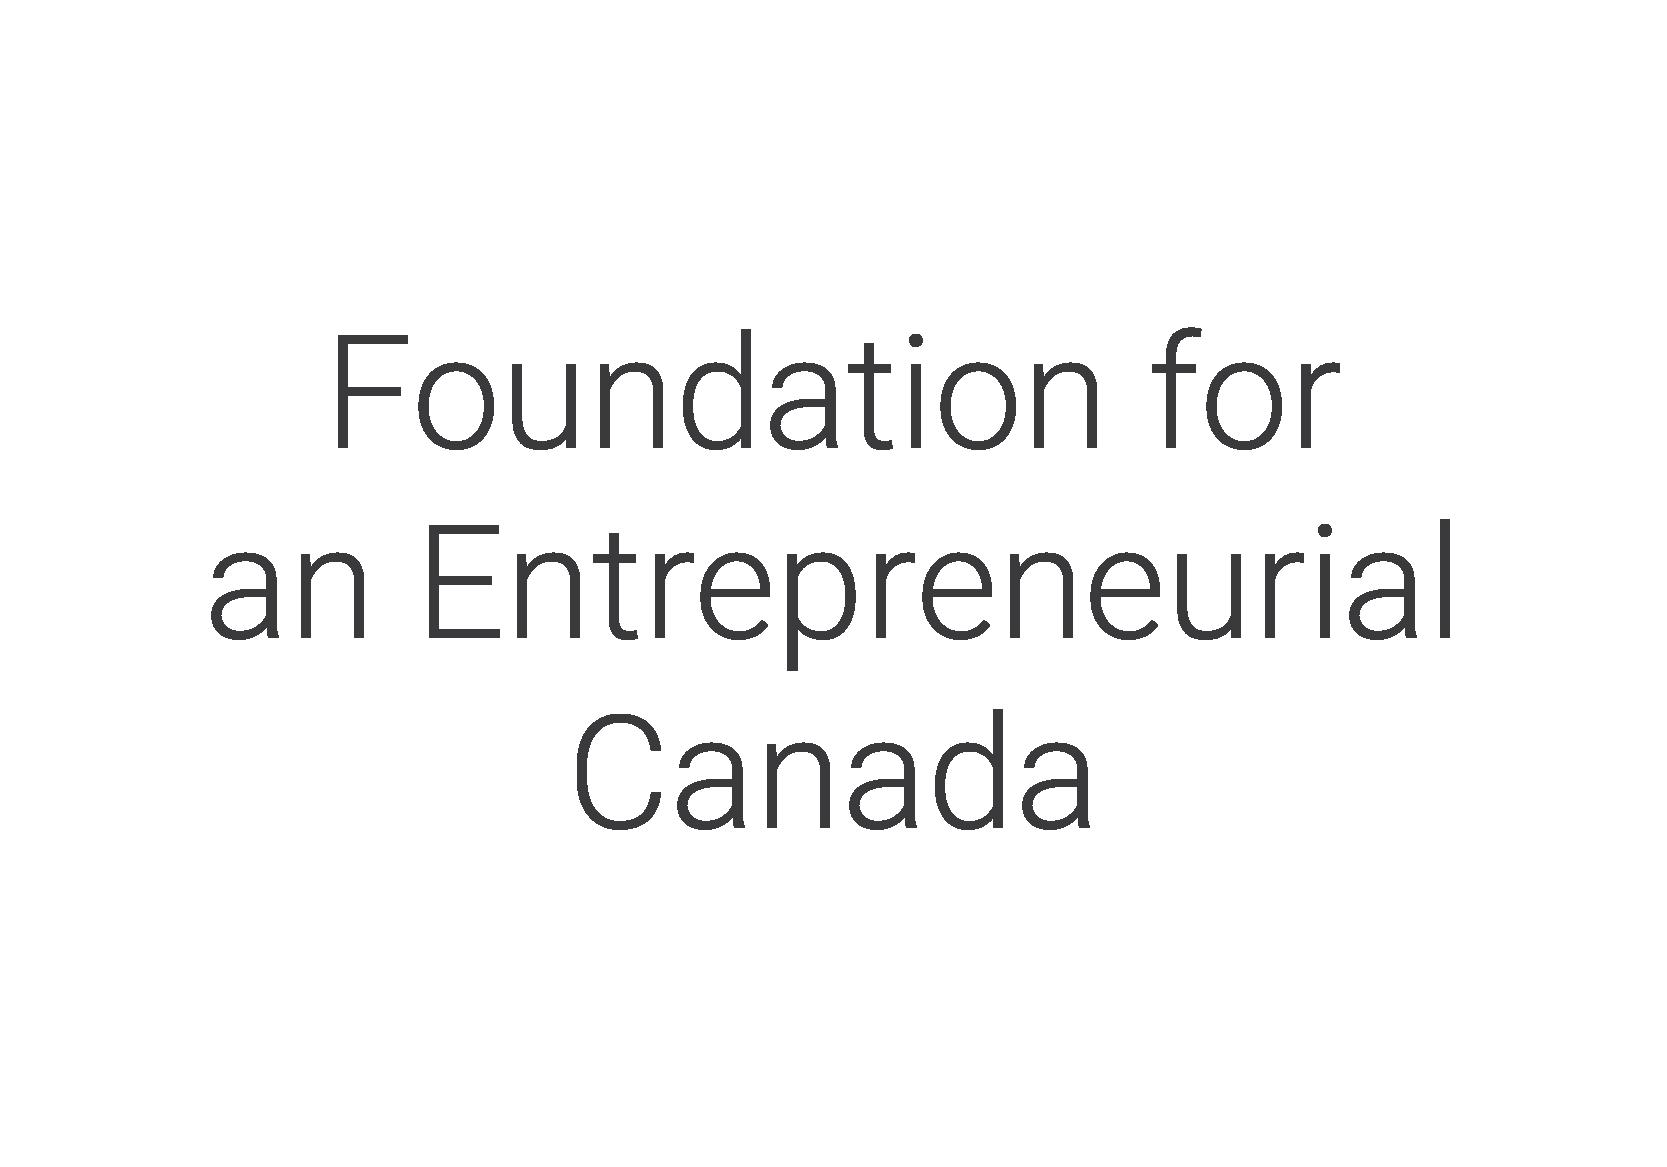 Foundation for an Entrepreneurial Canada